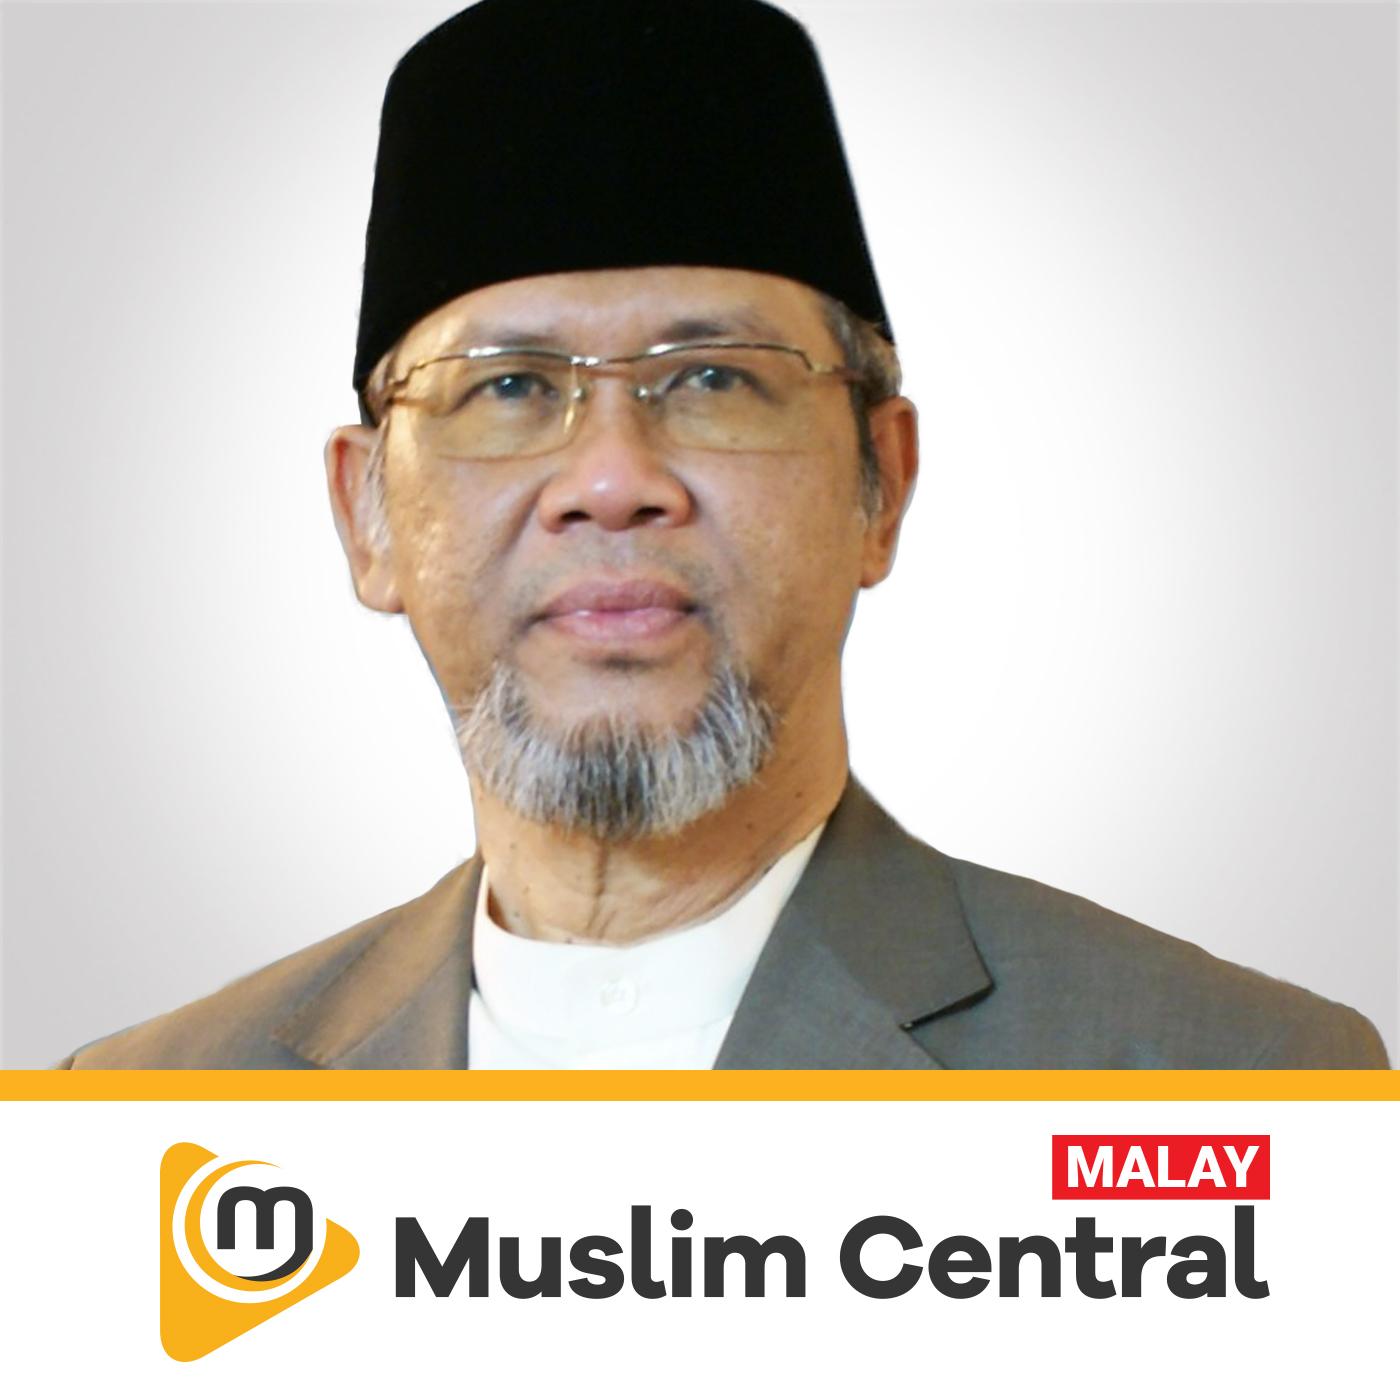 Muslim Central